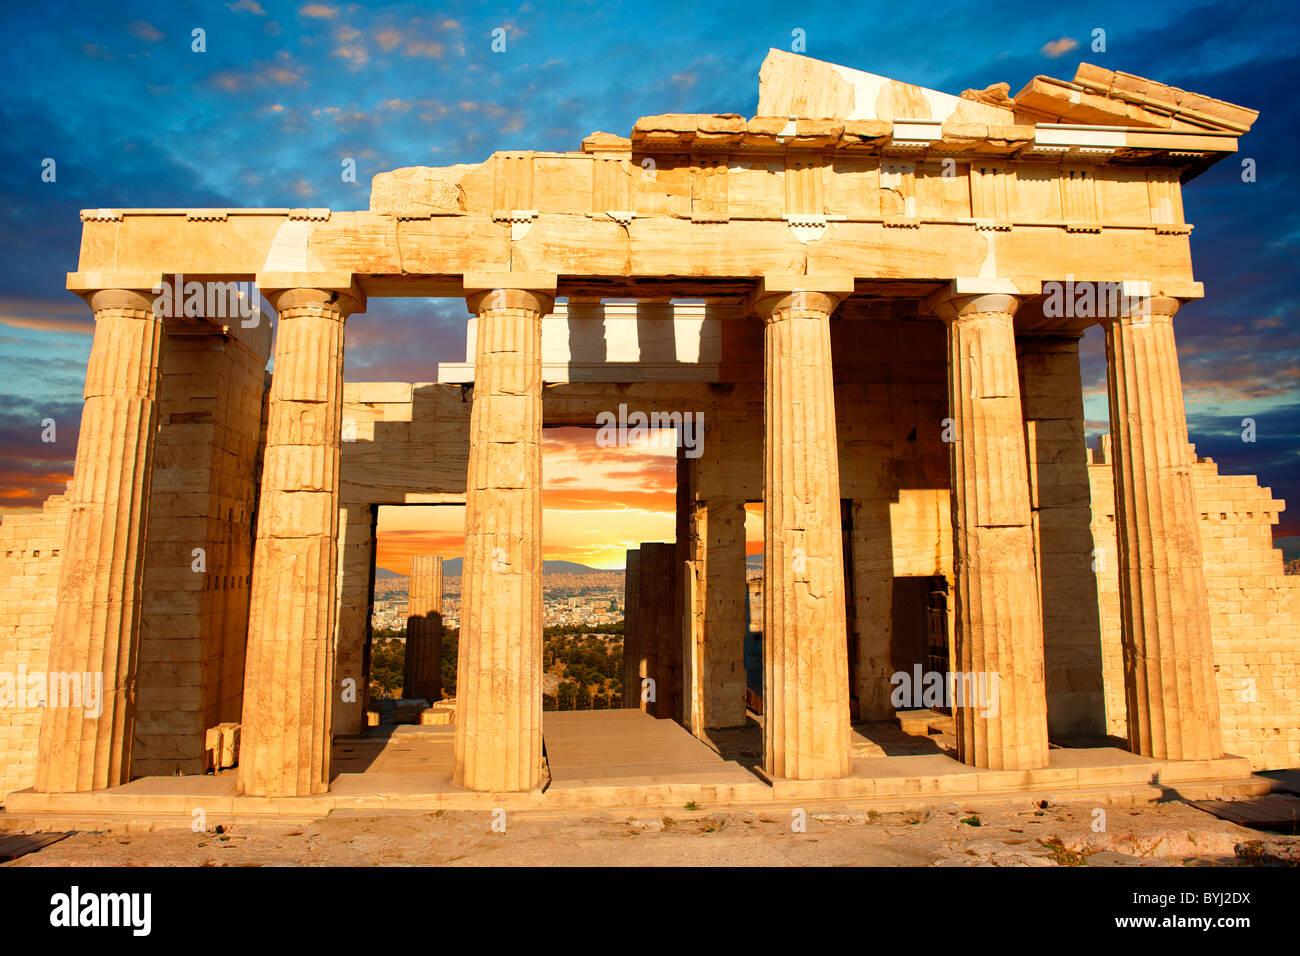 The Propylaea, The monumental gateway to the Acropolis, Athens, Greece - Stock Image